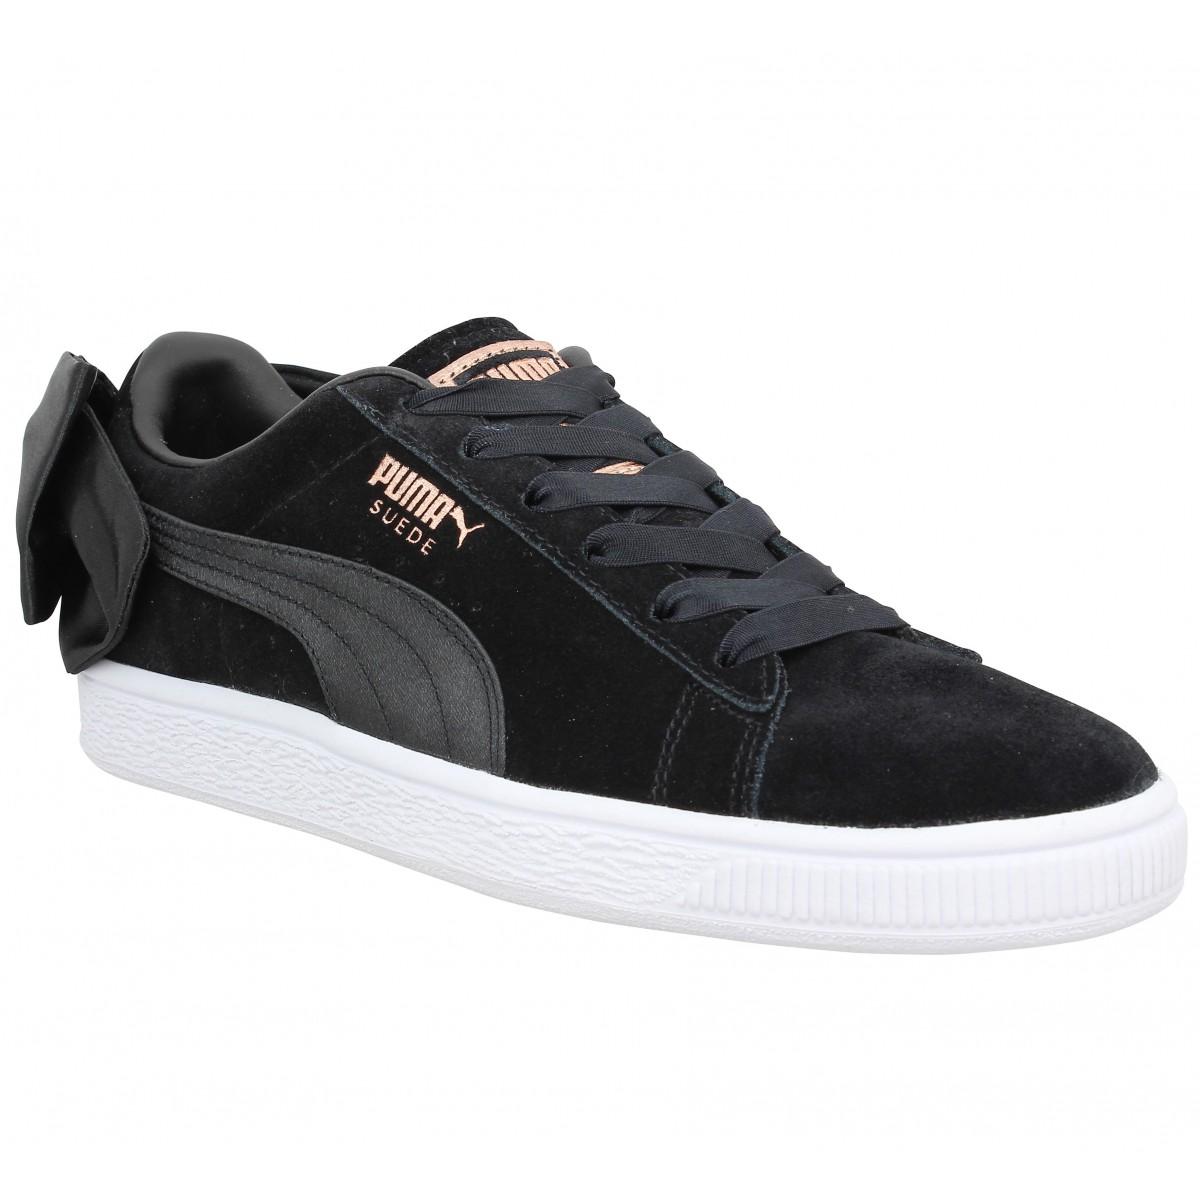 Puma Sneakers Femme Noir, 40